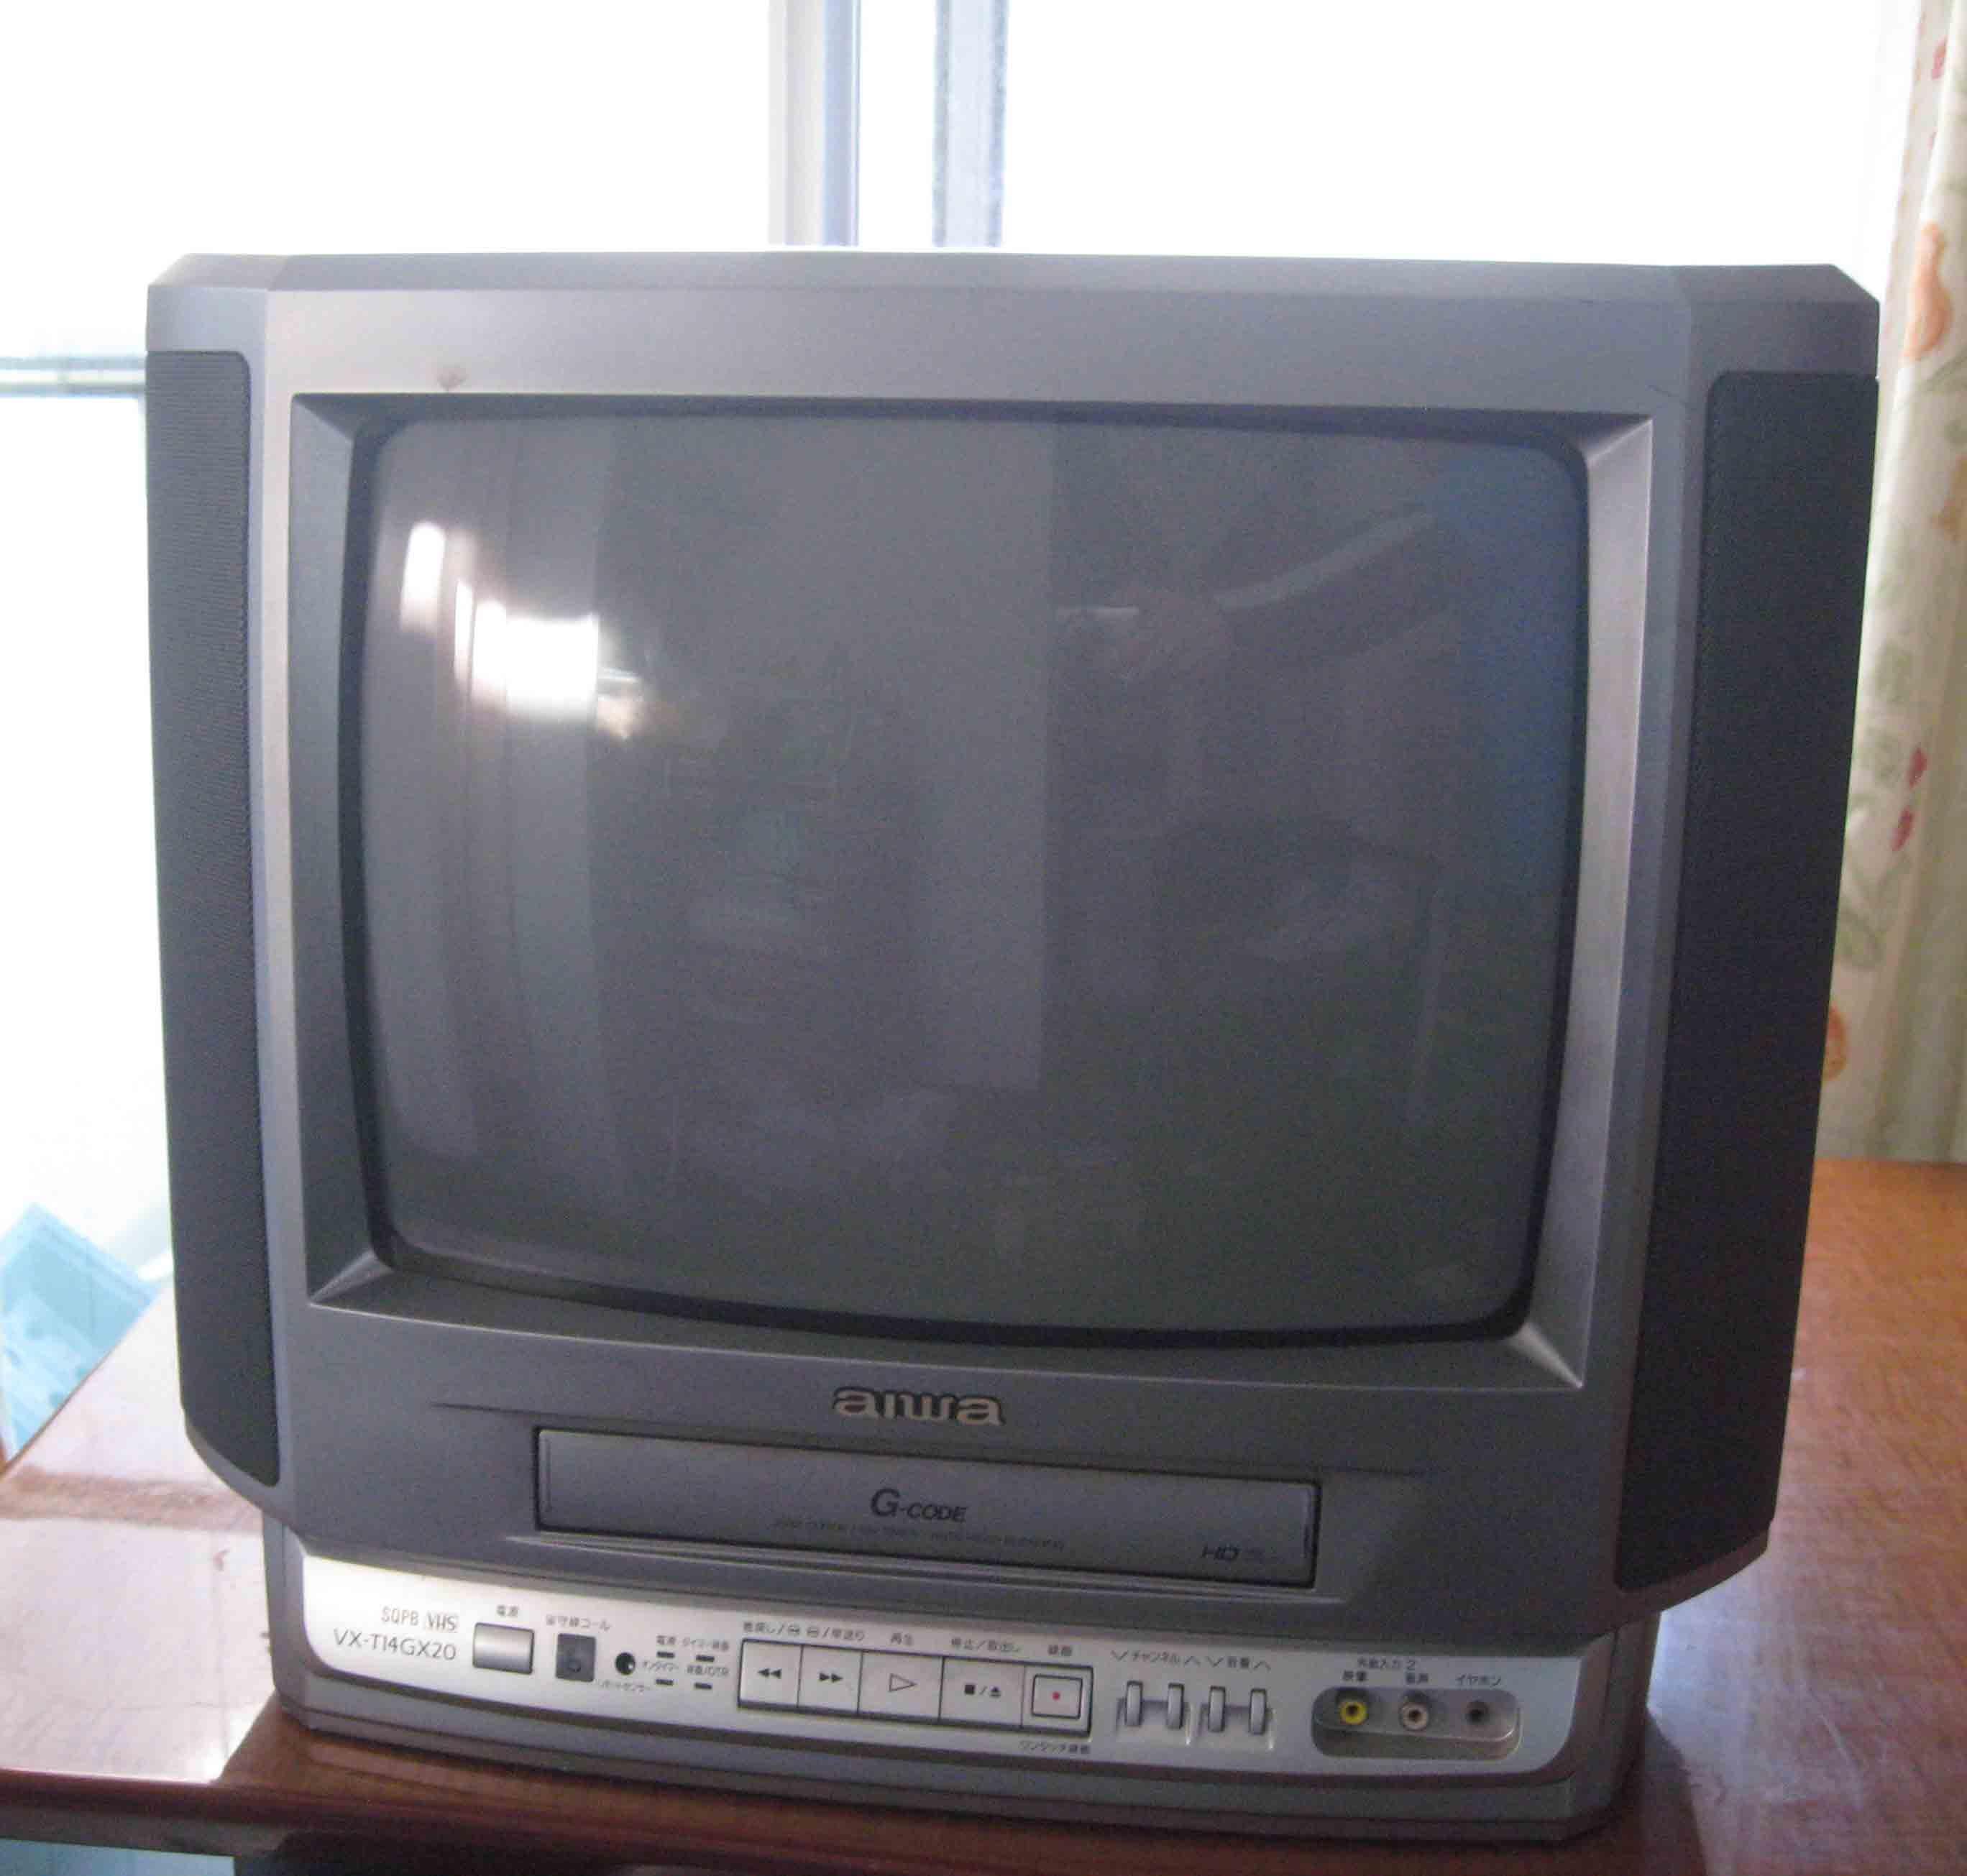 tv and radio service manual 2011 rh tvservicesanual blogspot com aiwa tv a219 manual aiwa smart tv manual